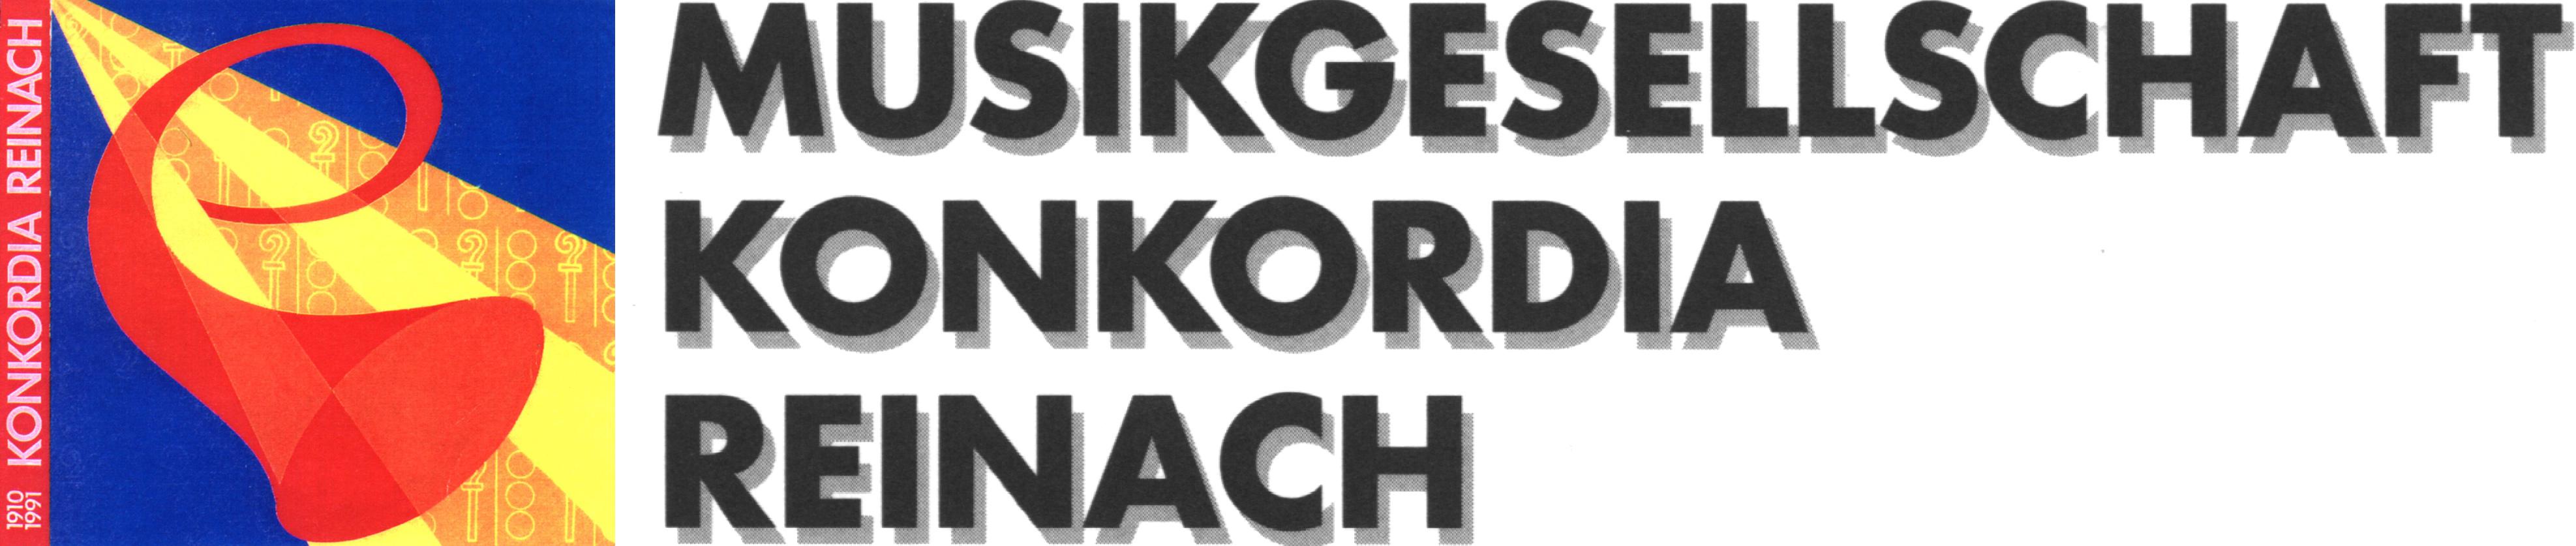 Musikgesellschaft Konkordia Reinach BL